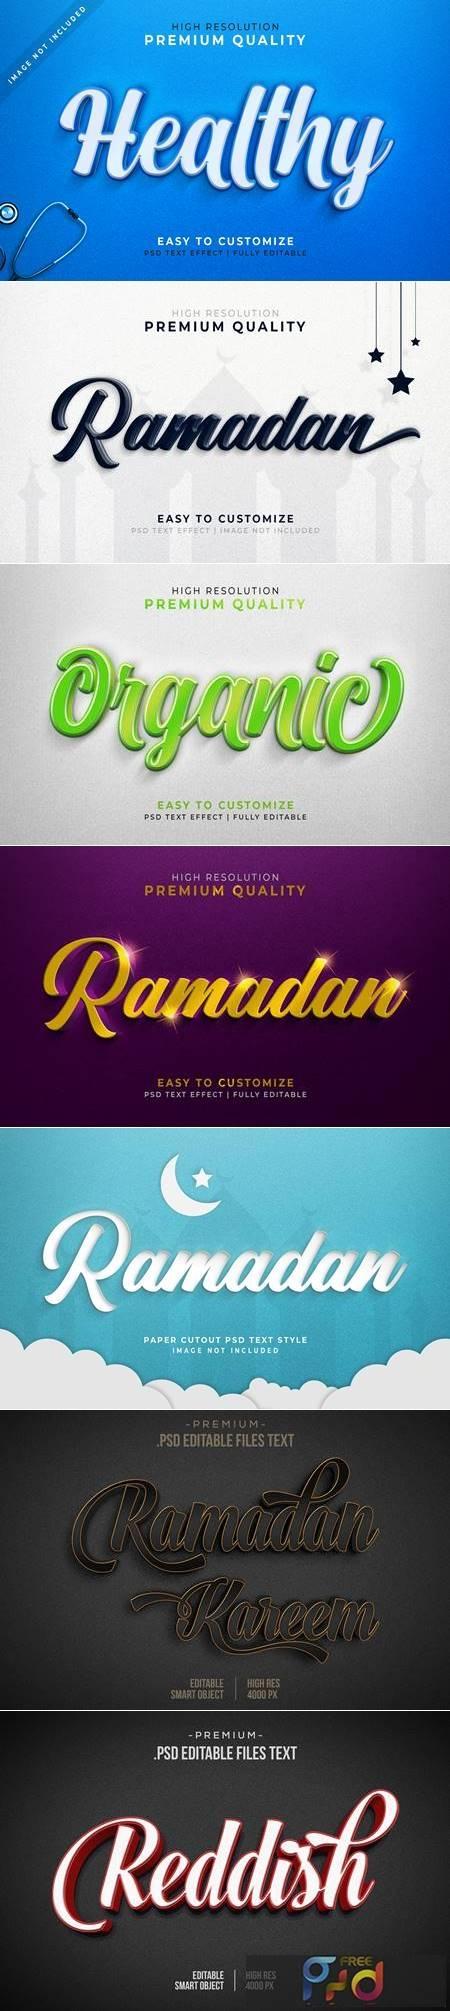 Luxurious ramadan 3d text style effect mockup 1